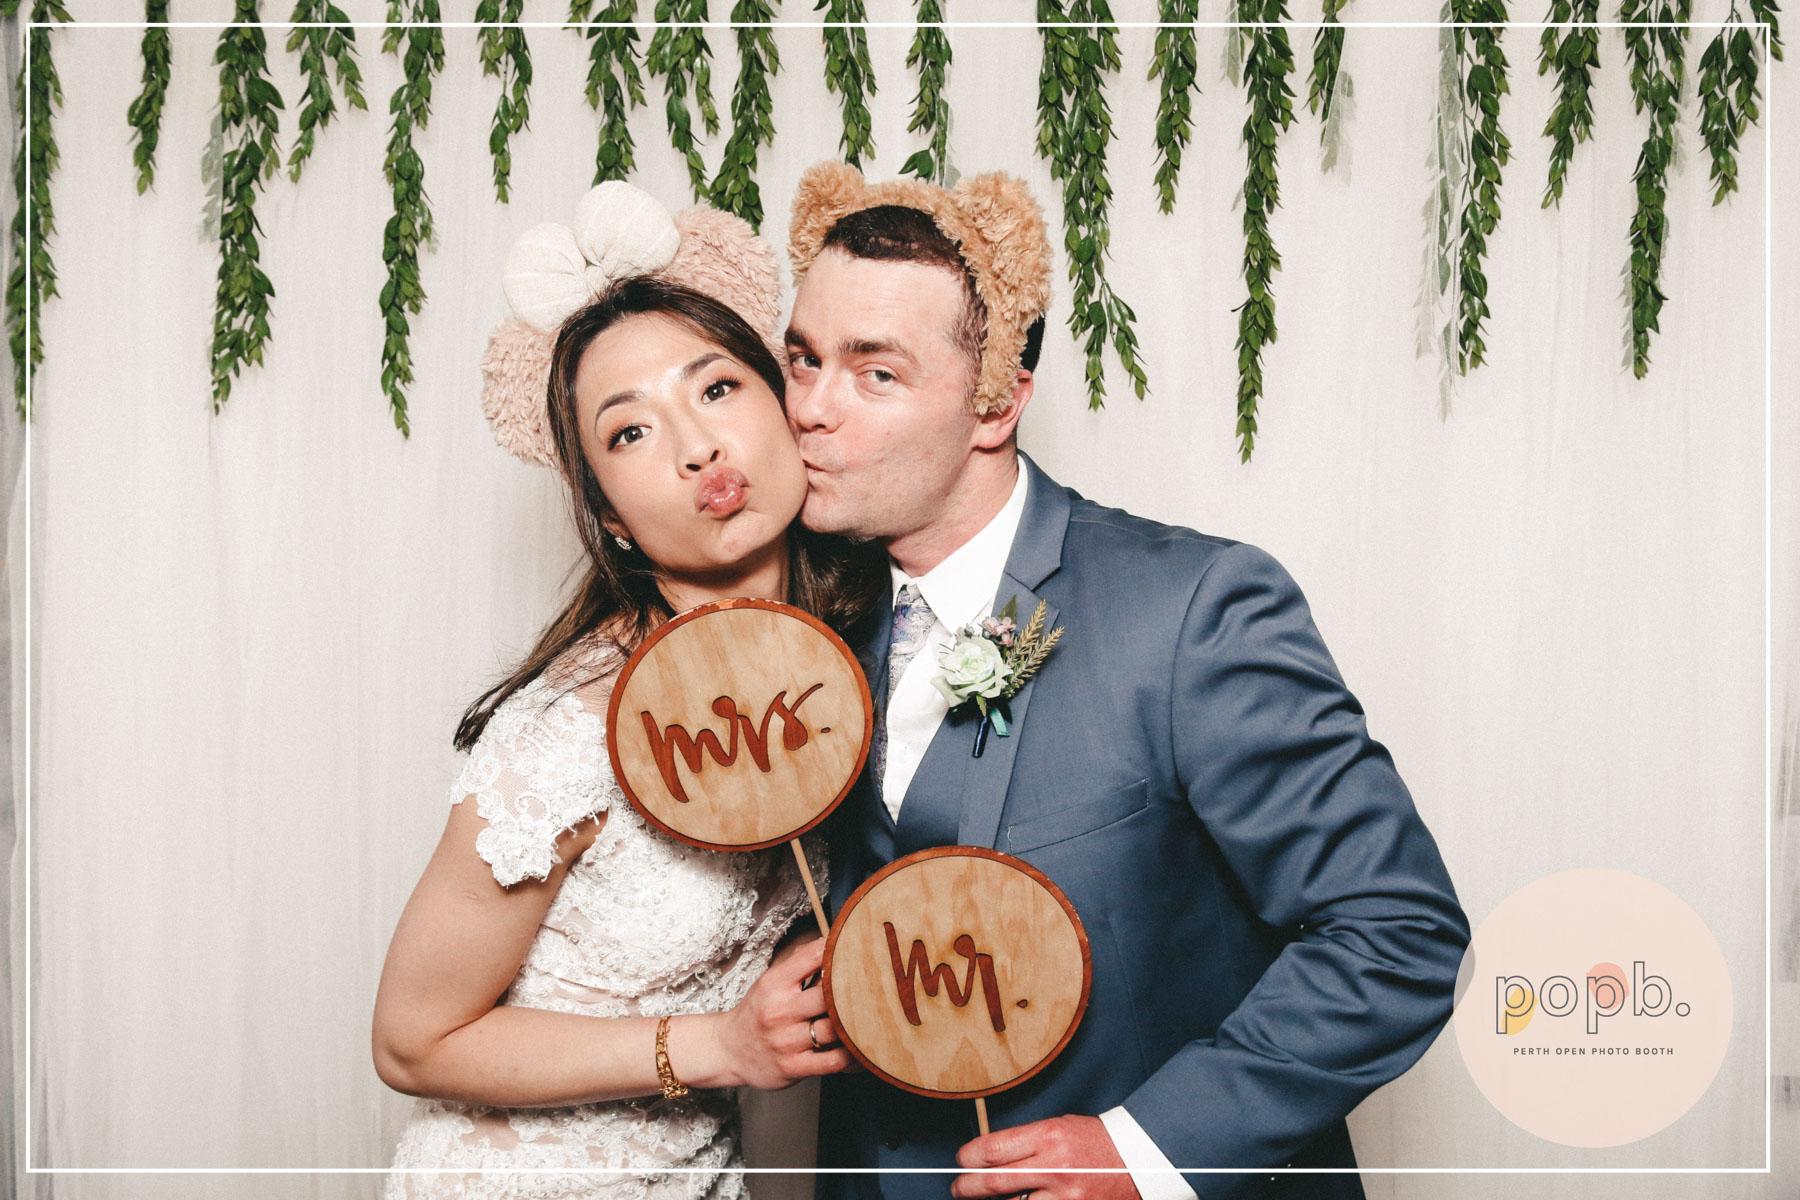 Chantal + David's Wedding - pASSWORD: PROVIDED ON THE NIGHT- ALL LOWERCASE -